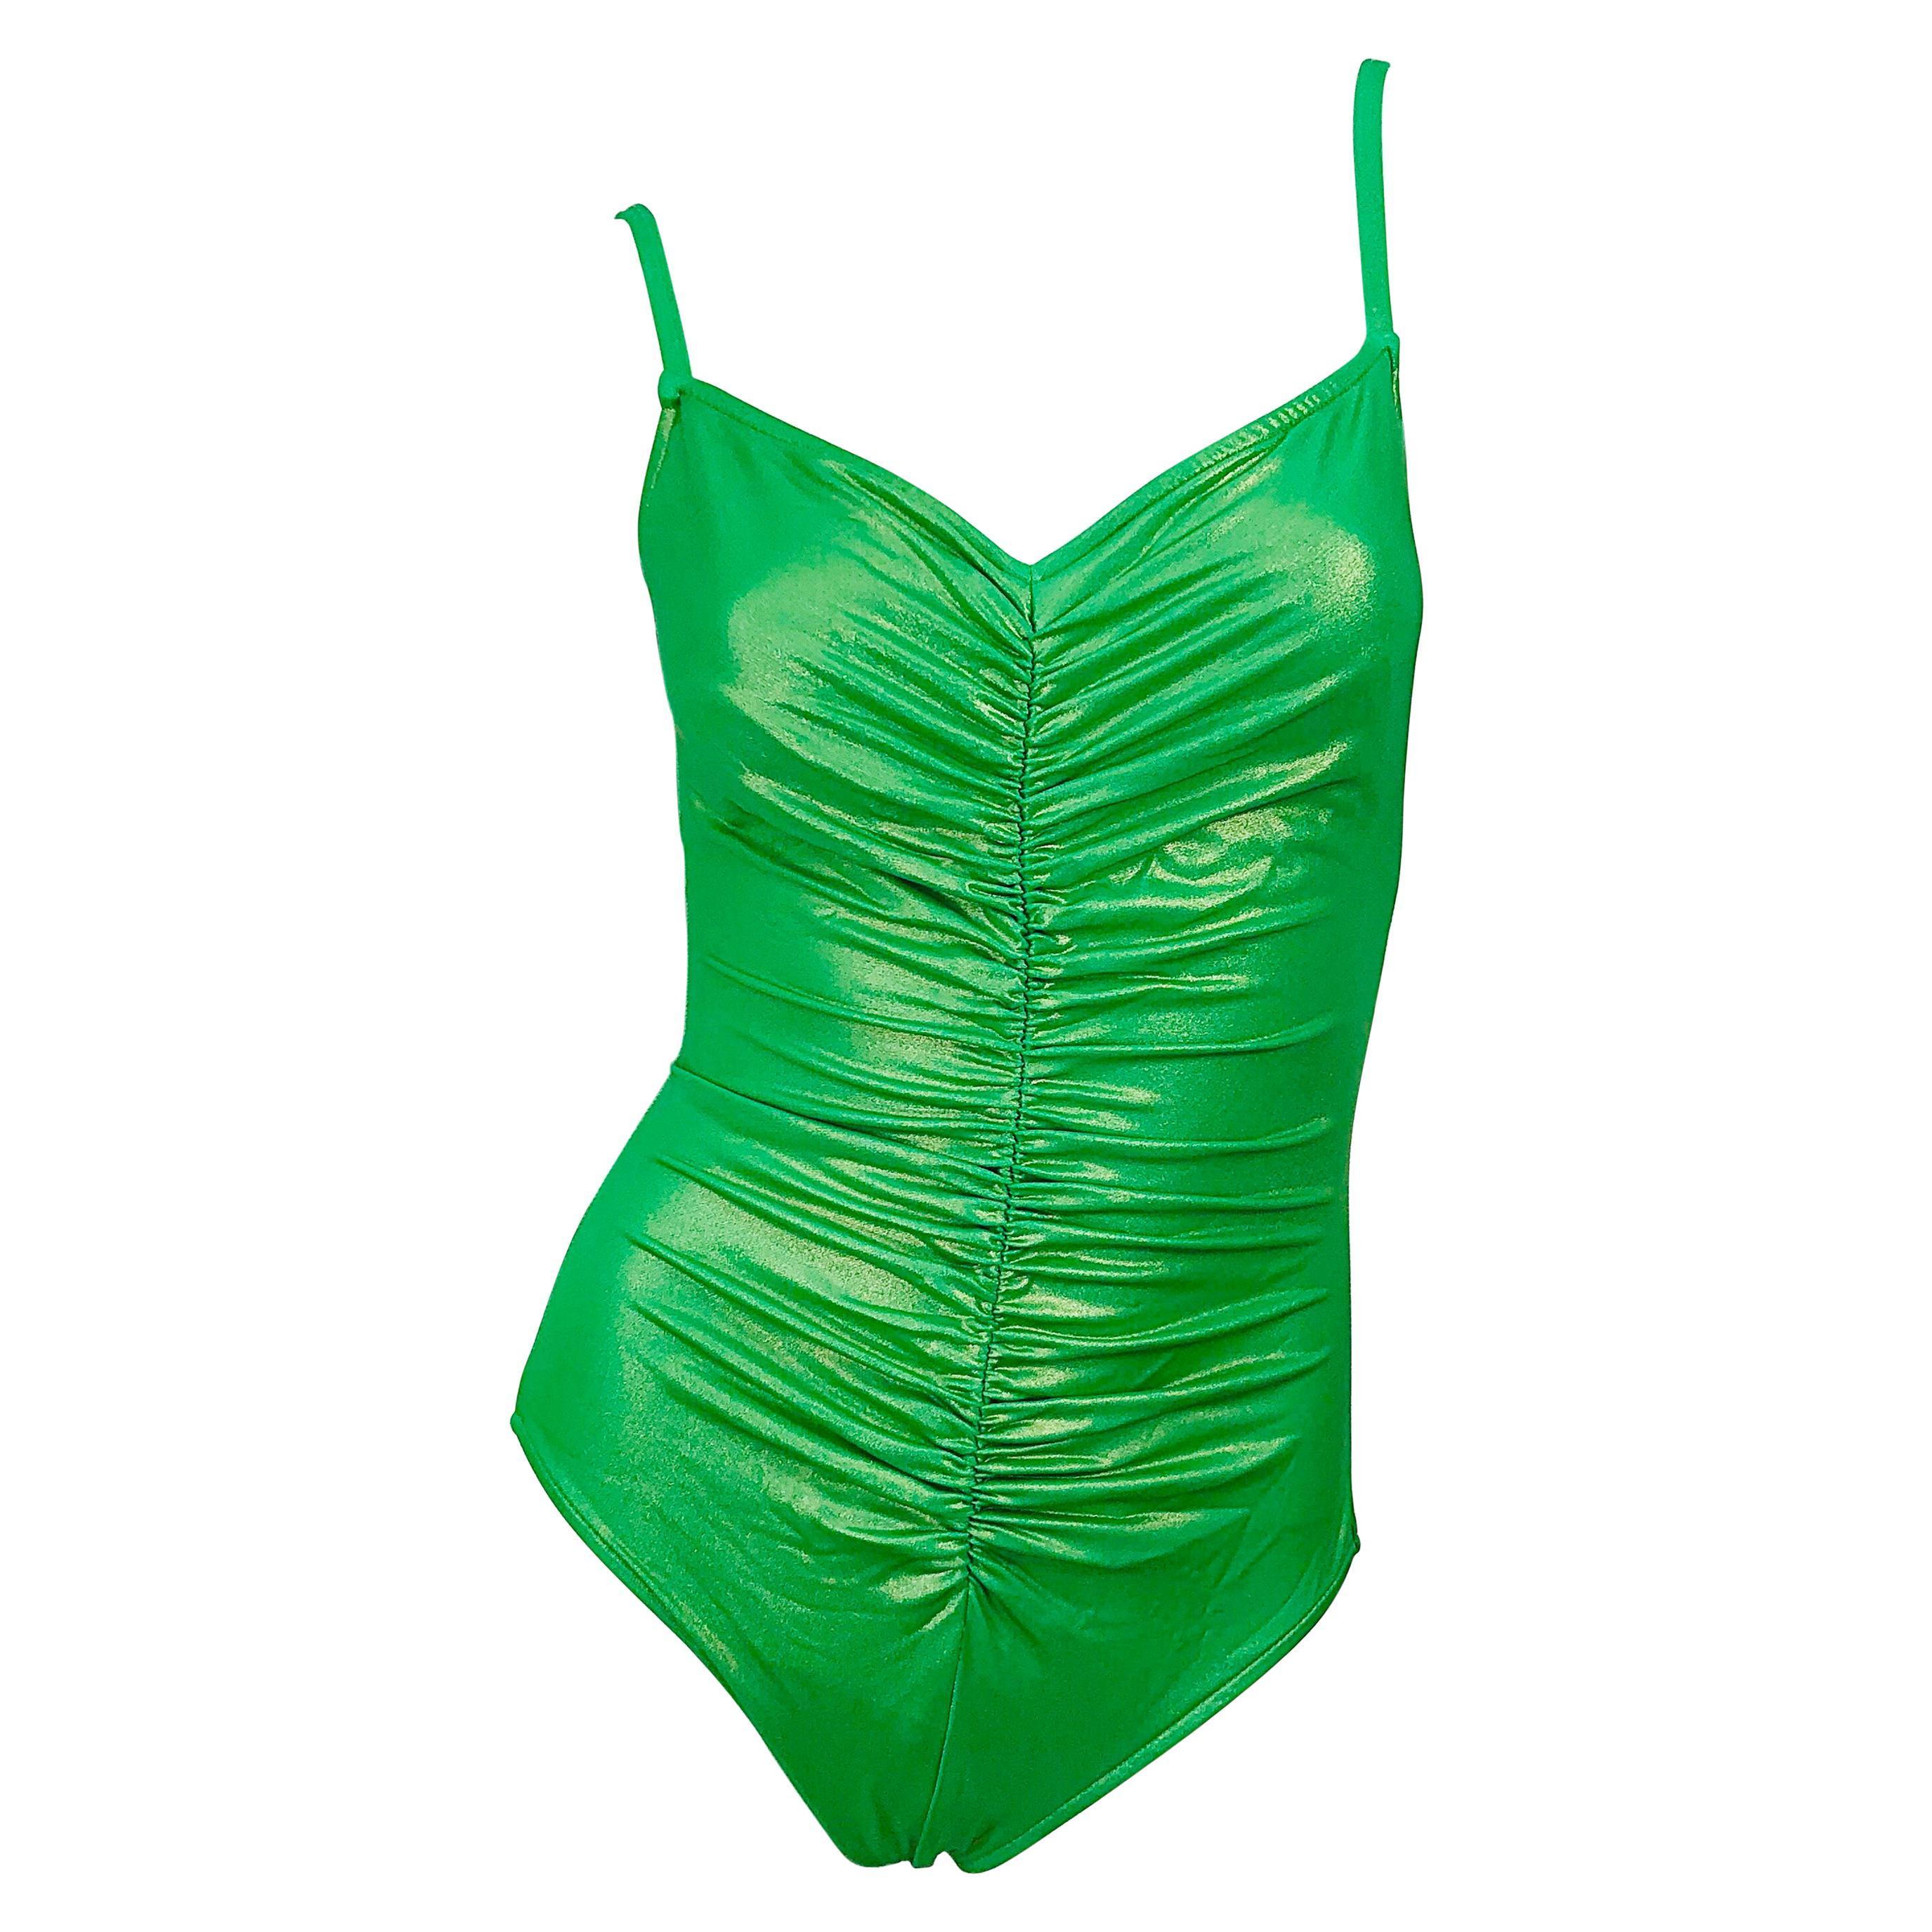 1980s Bill Blass Neon Green One Piece Ruched Vintage 80s Swimsuit / Bodysuit